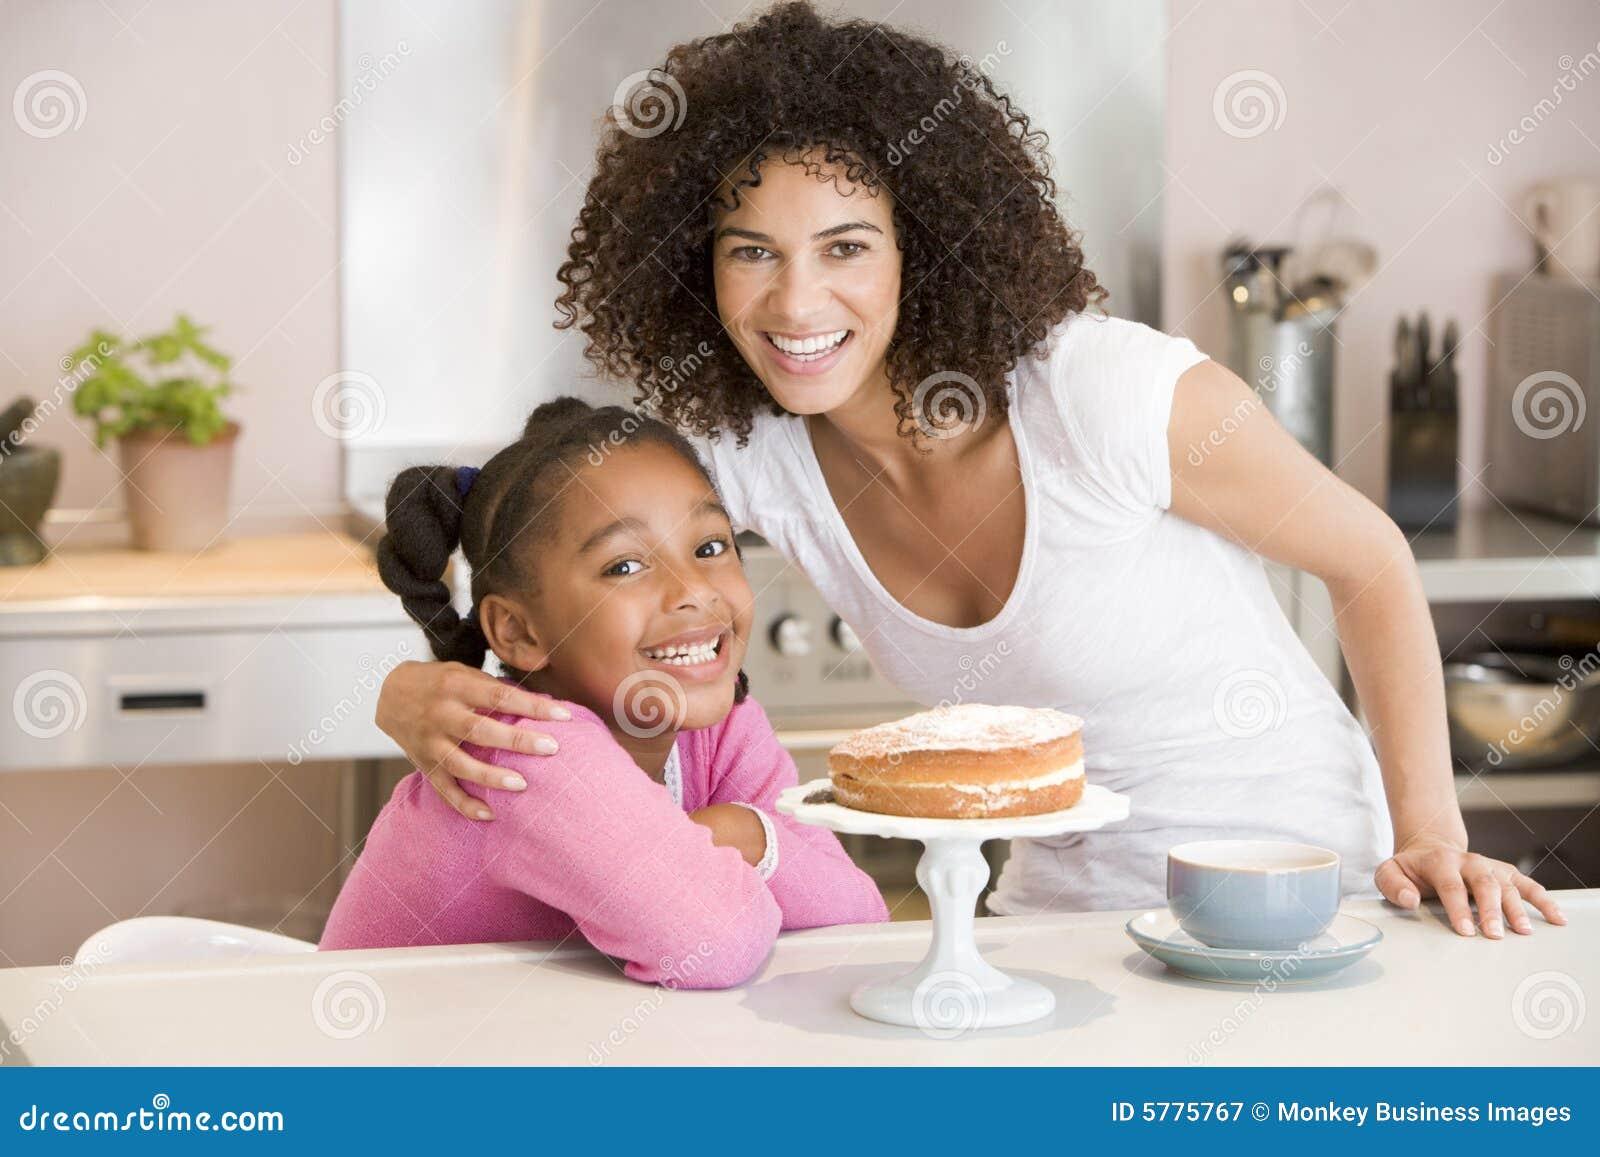 Vrouw en jong meisje in keuken met cake en coff